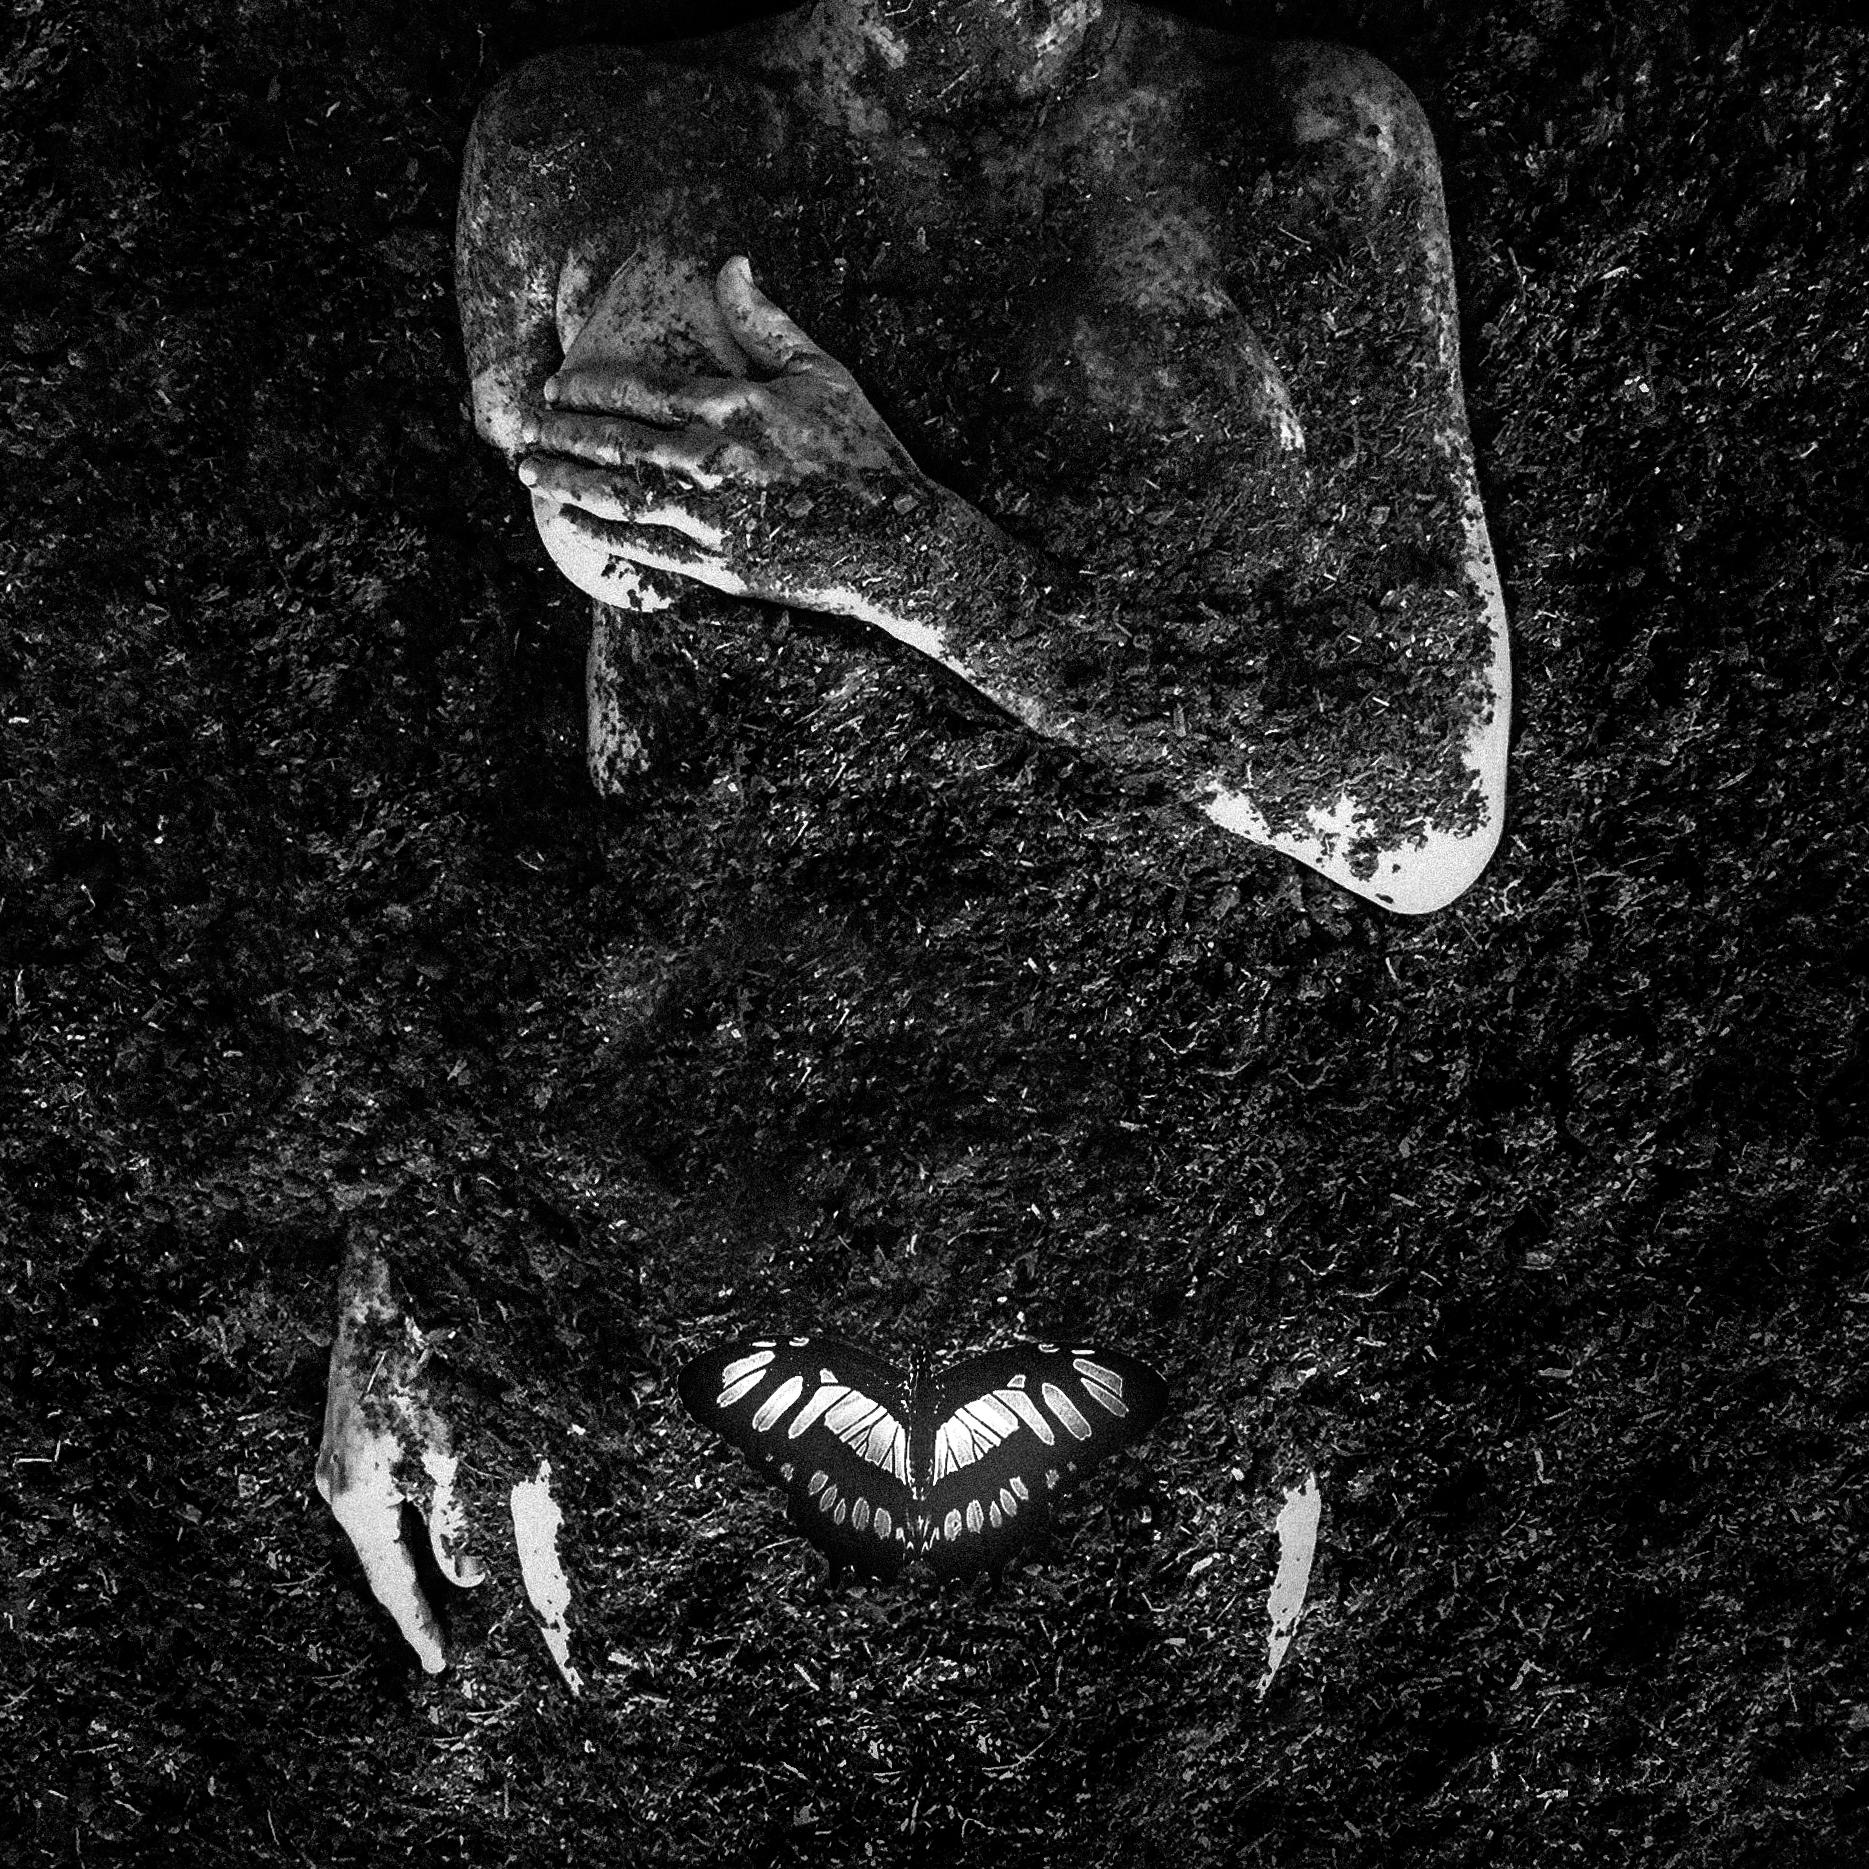 Dirt Body Butterfly_001_Dec_LR.jpg